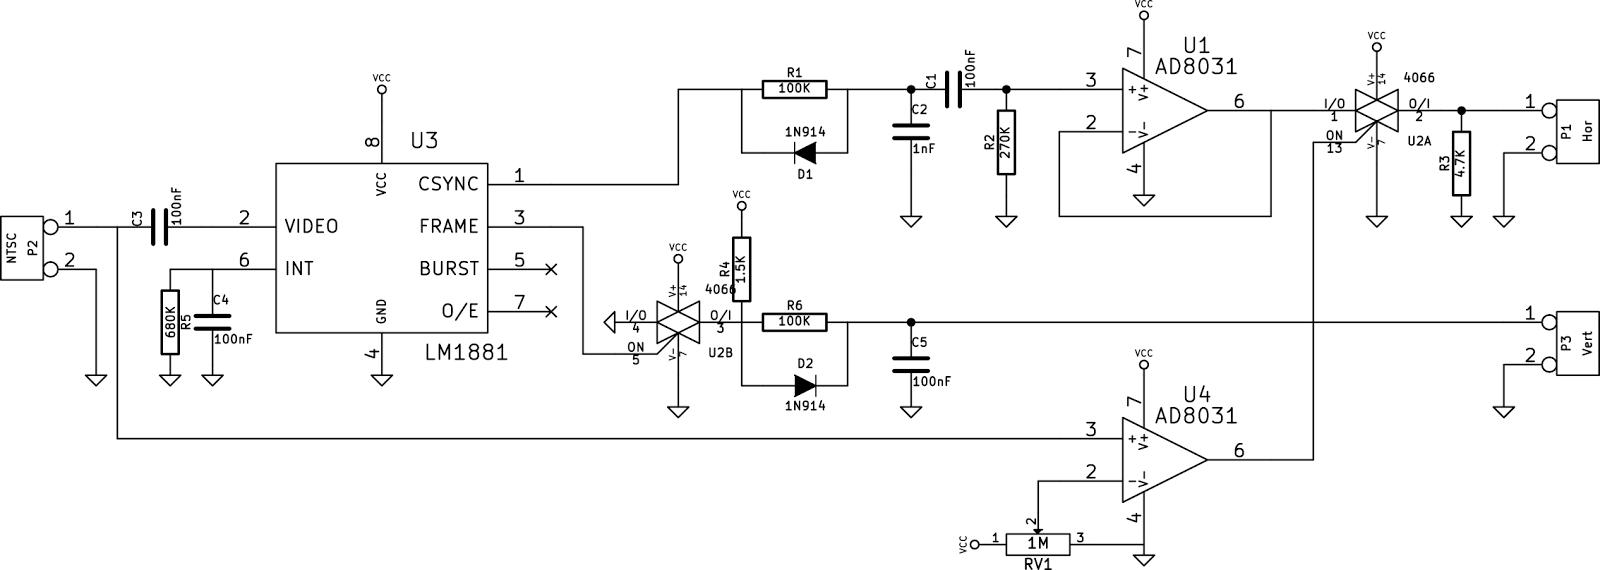 Video Switch Circuit Schematic Diagram